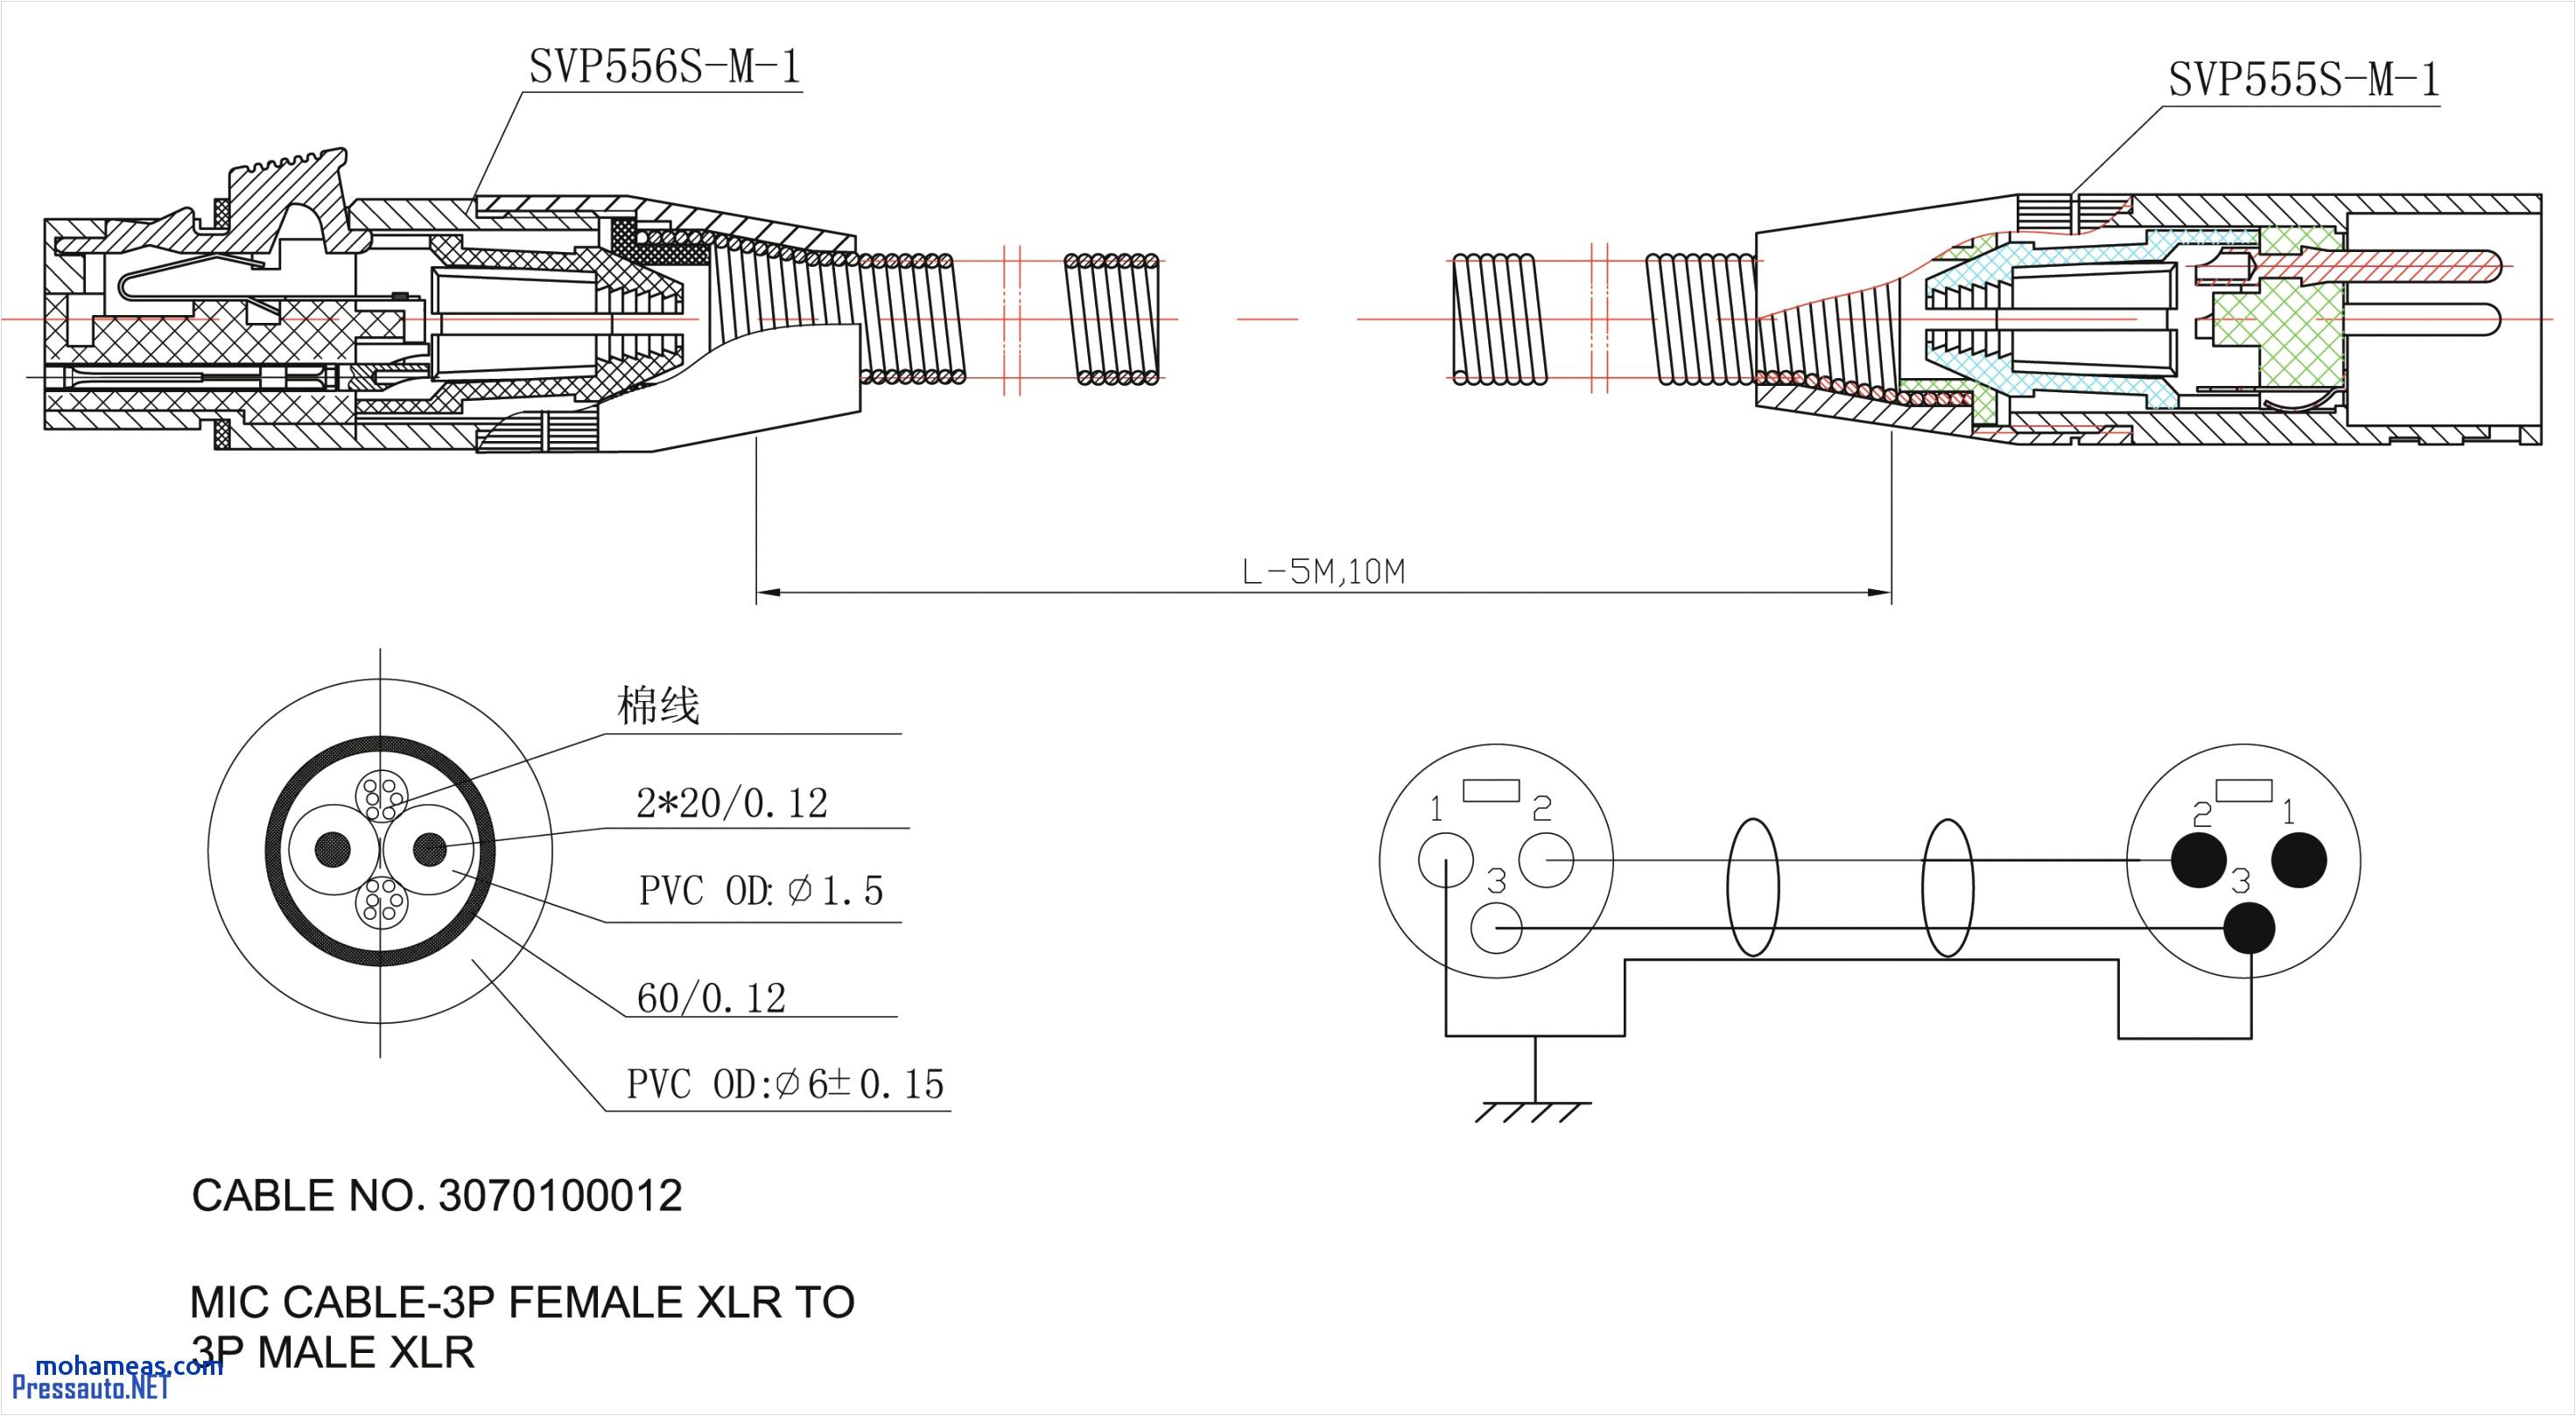 wiring diagram for ge washer wiring diagram centre ge washer timer diagram luxury gtwn4250d1ws ge washerge